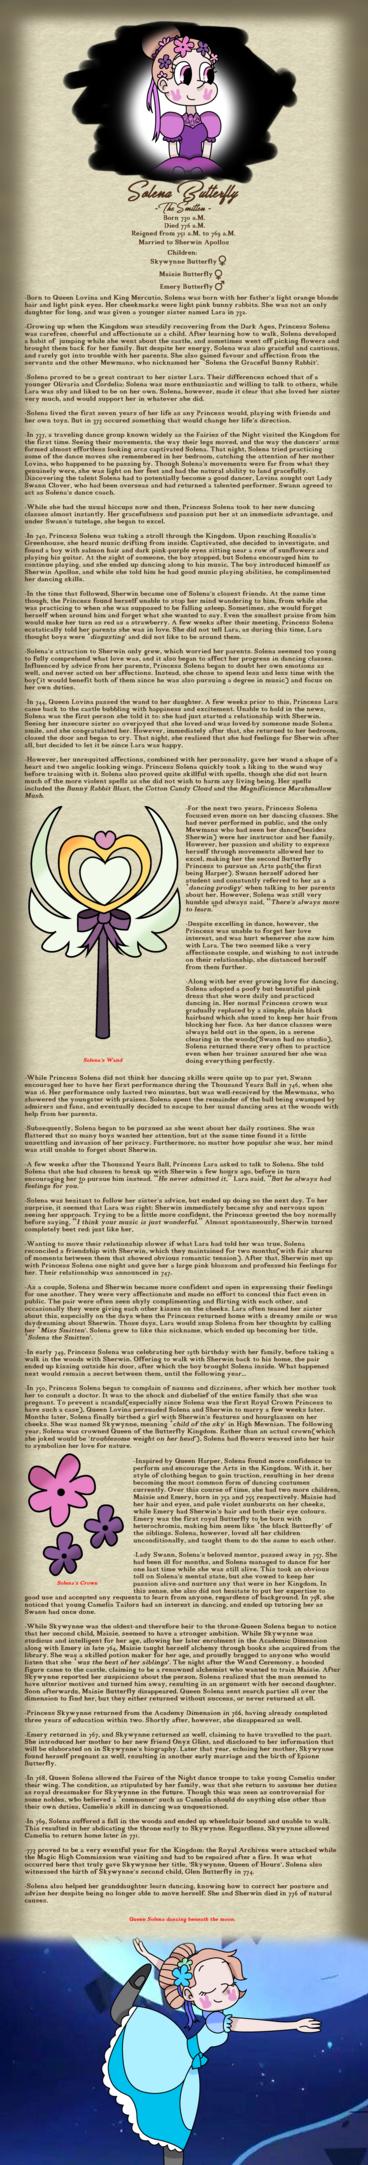 Biography of Solena, the Smitten by XxFrostflare | Svtfoe